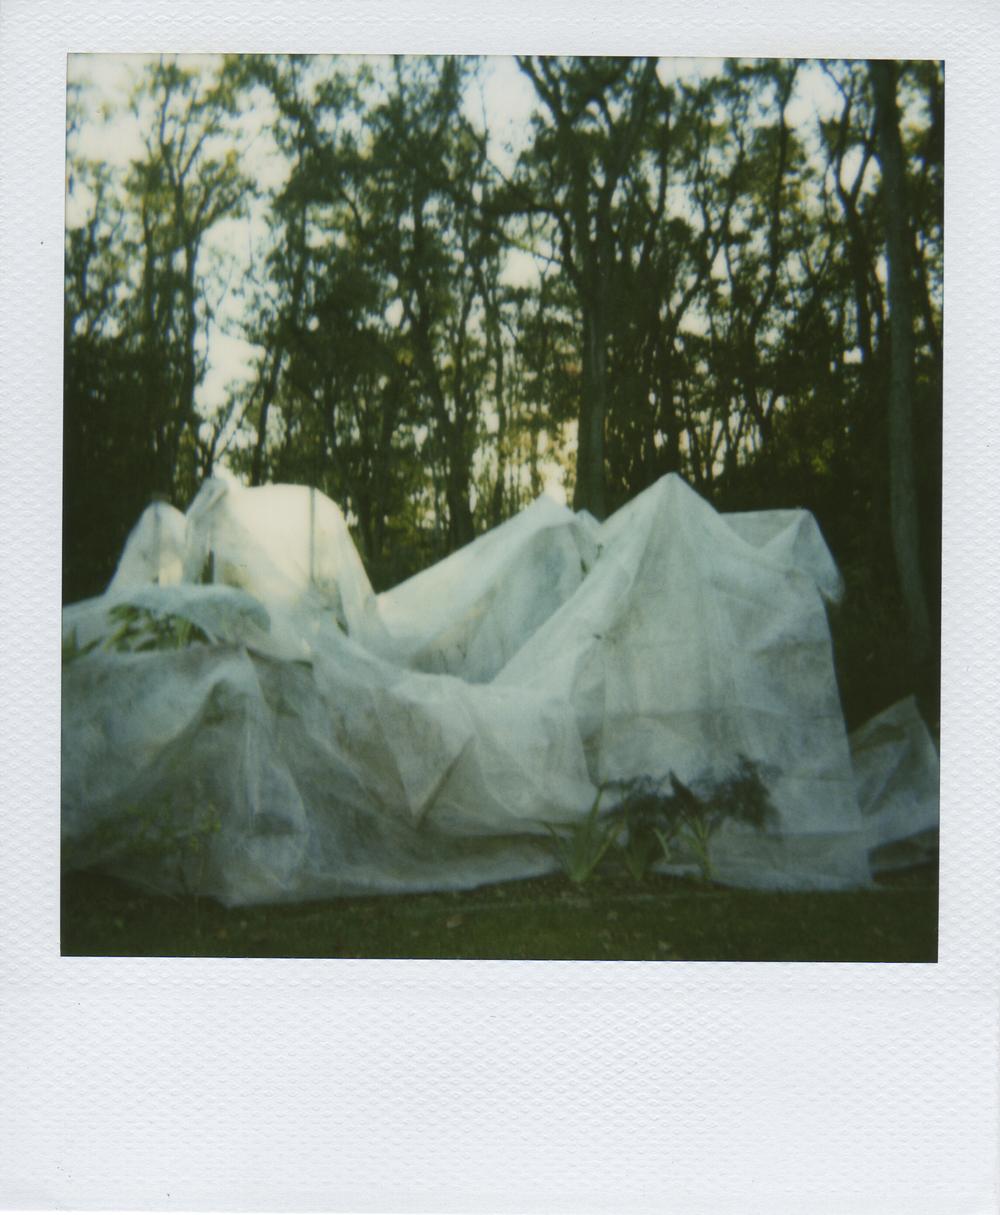 jlaurence-polaroid-019.jpg